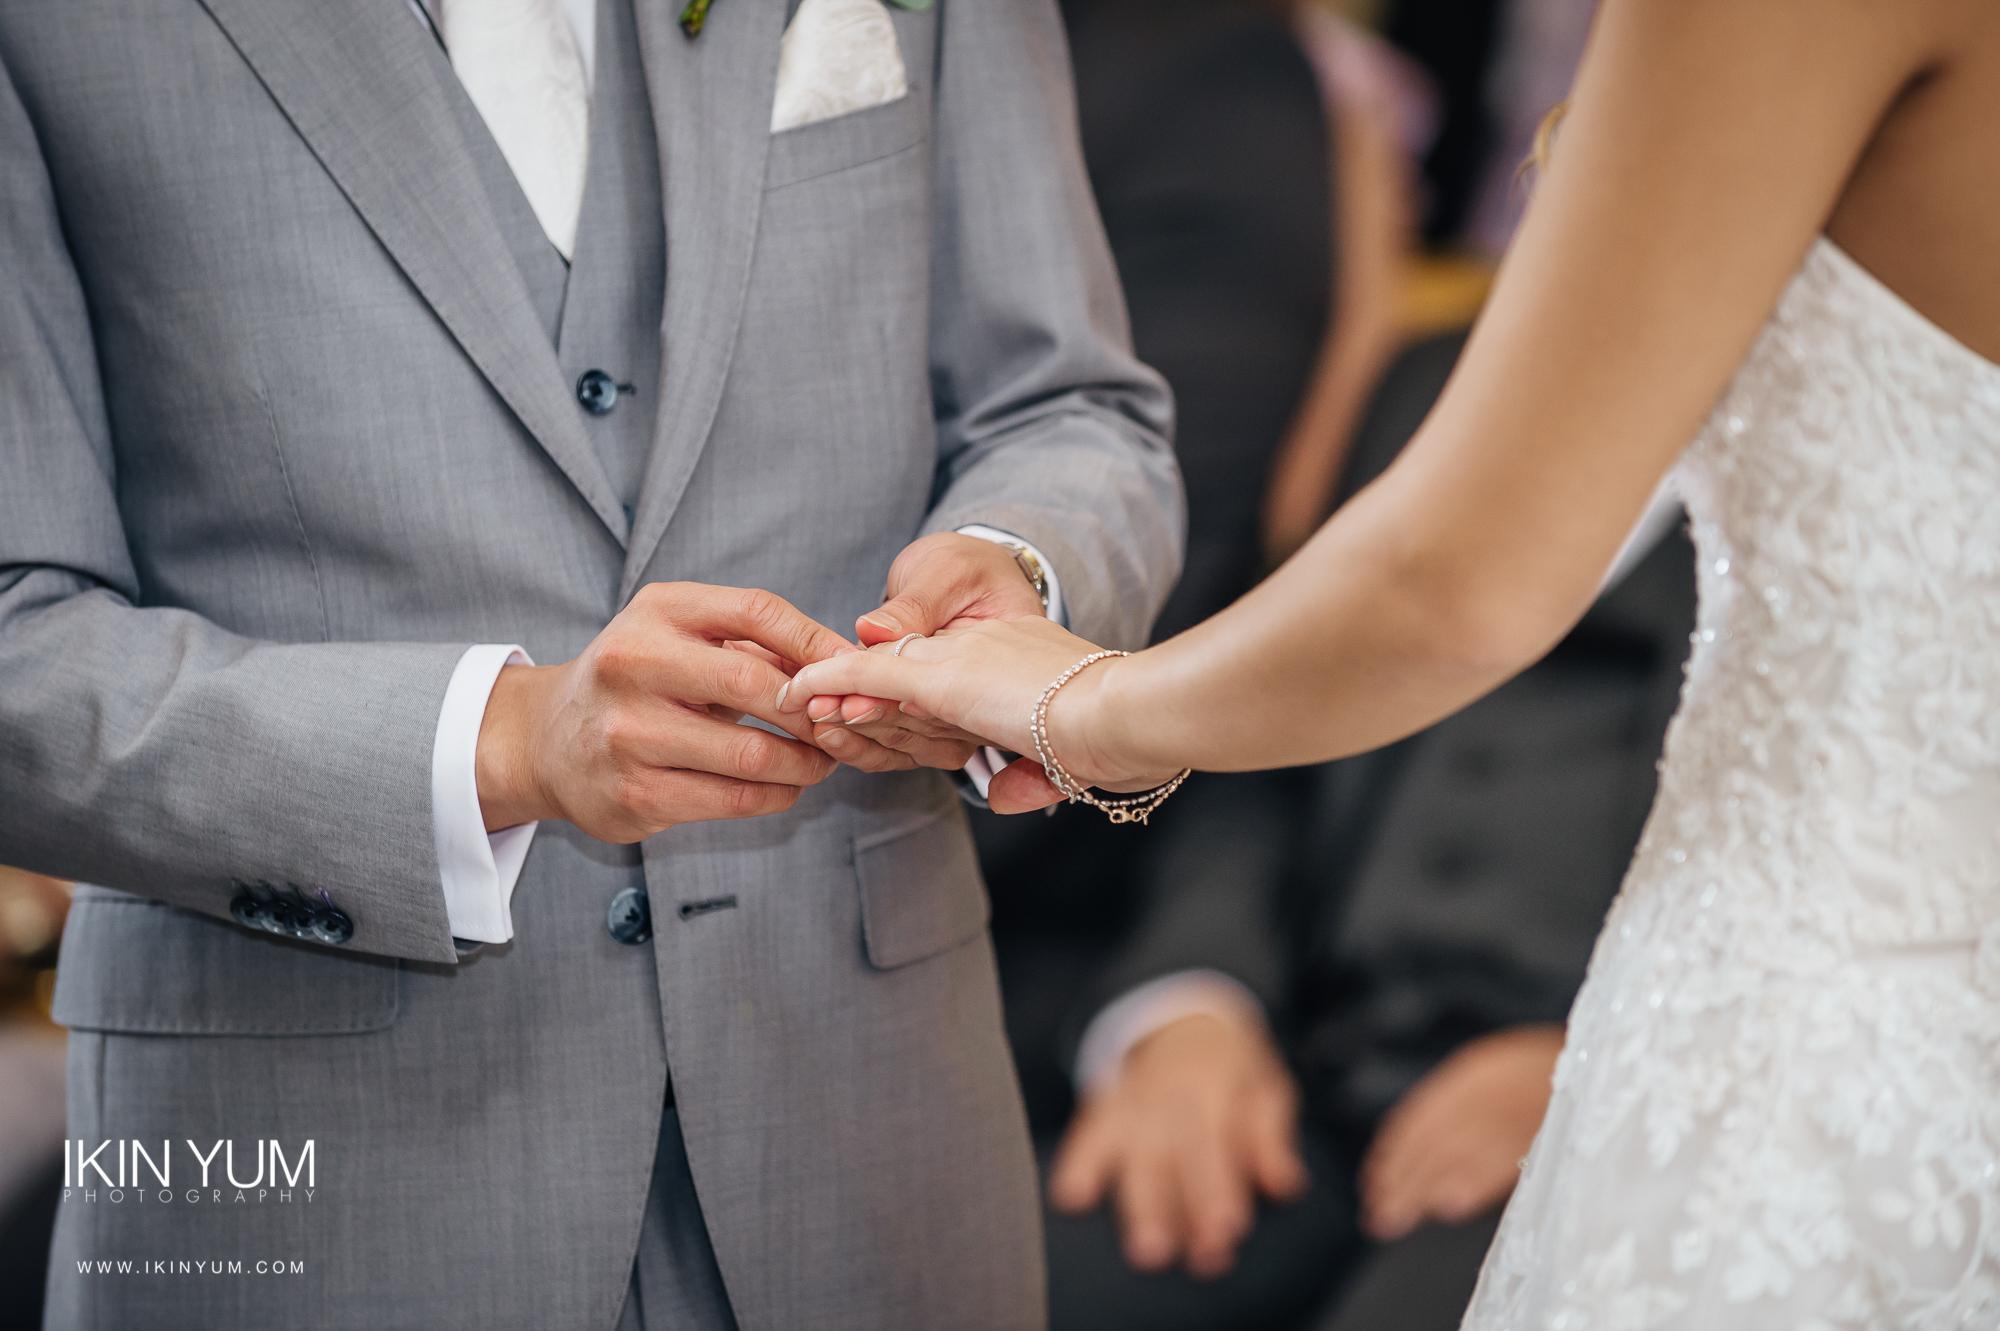 Syon Park Wedding - Ikin Yum Photography -053.jpg